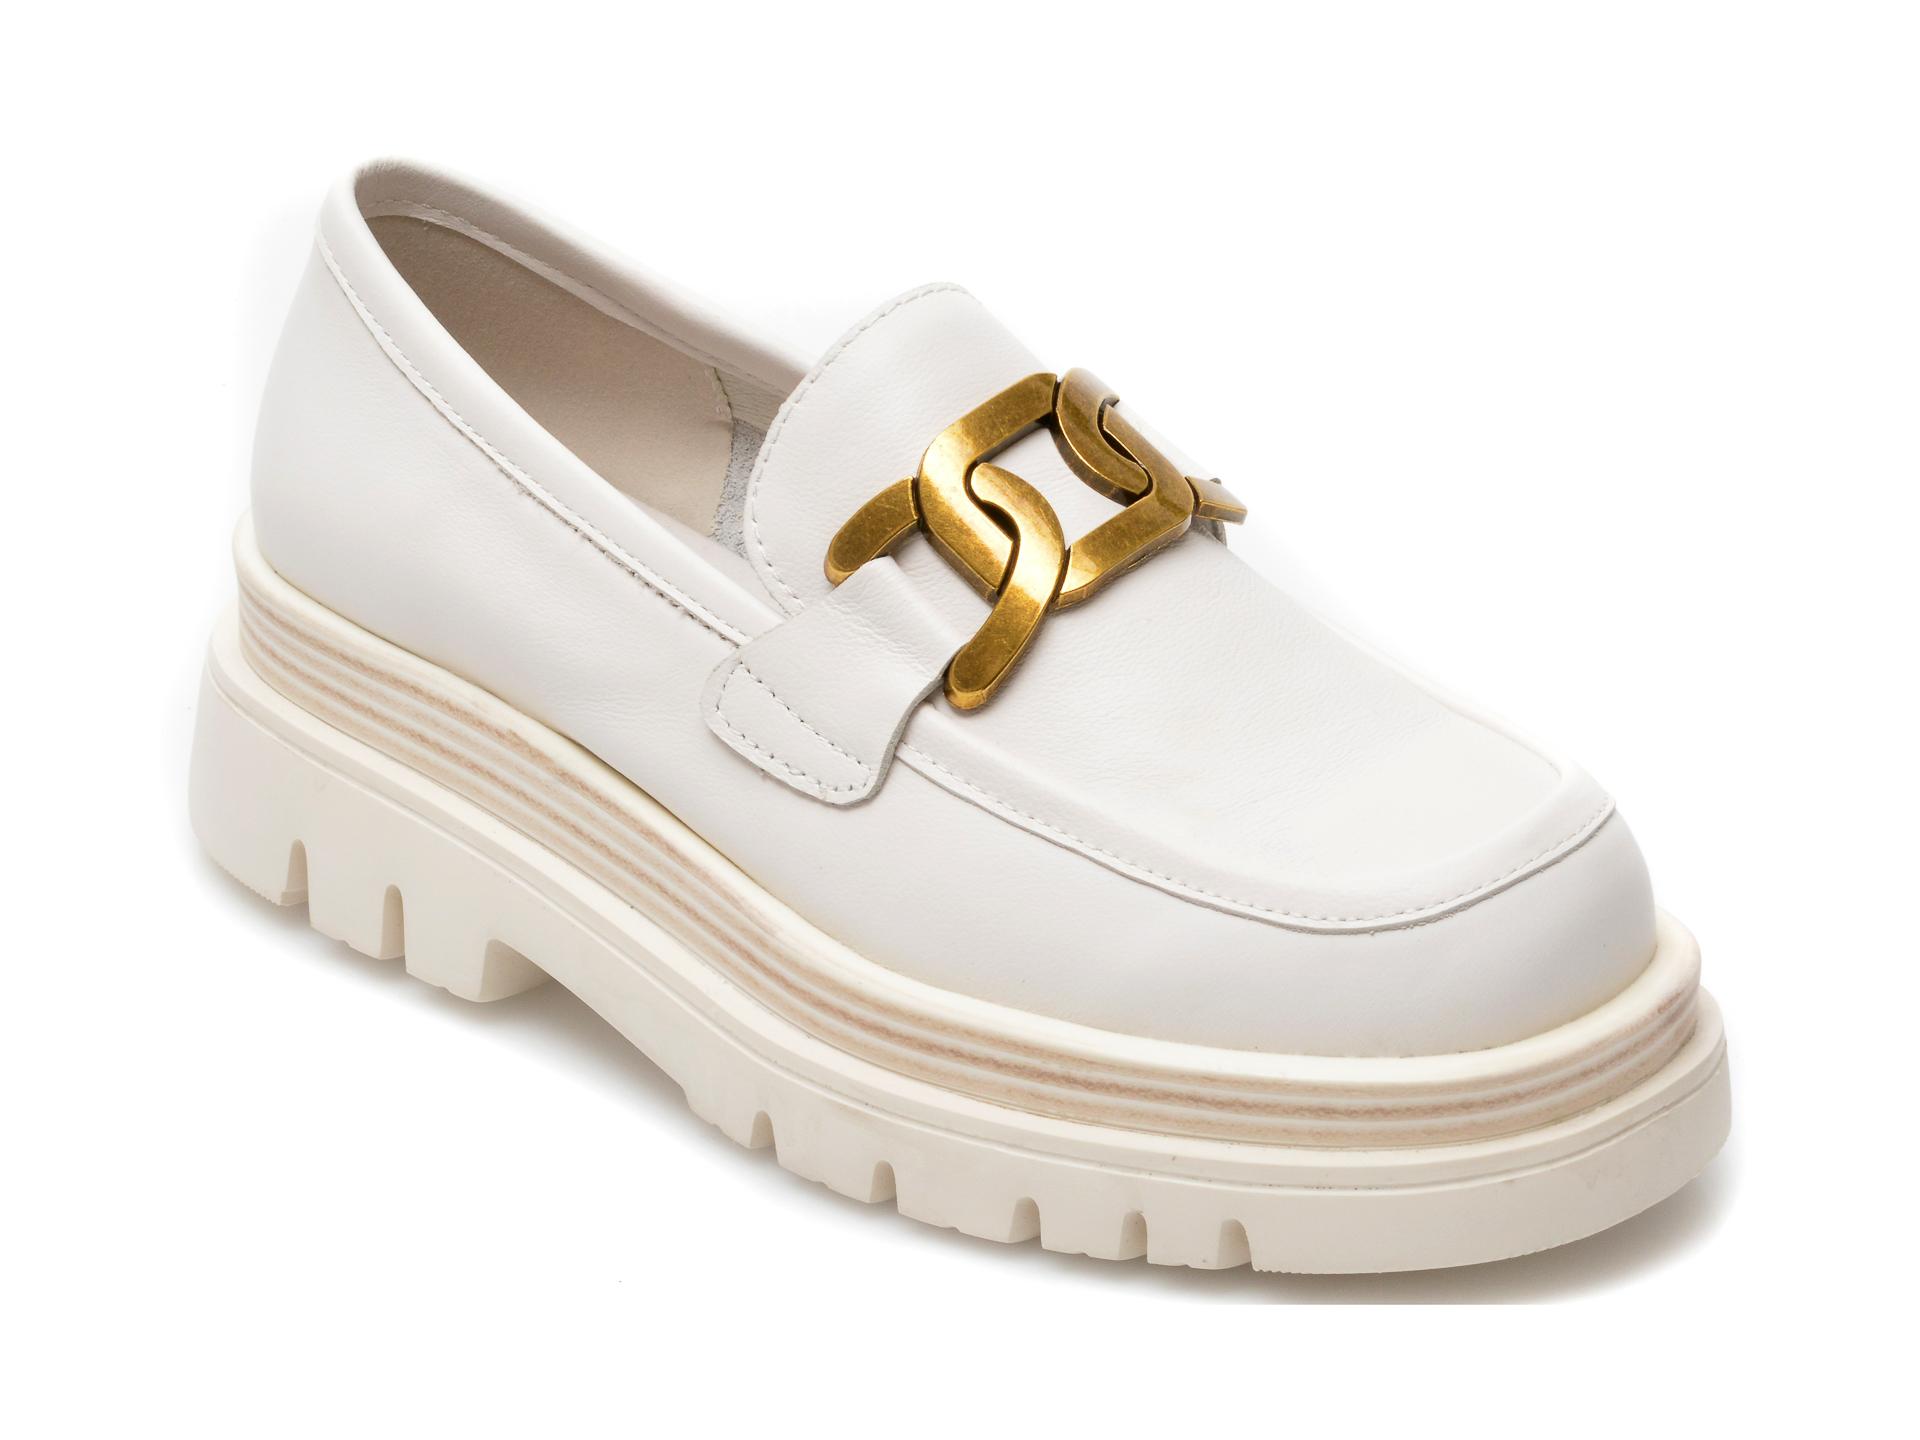 Pantofi GRYXX albi, Z019, din piele naturala imagine otter.ro 2021